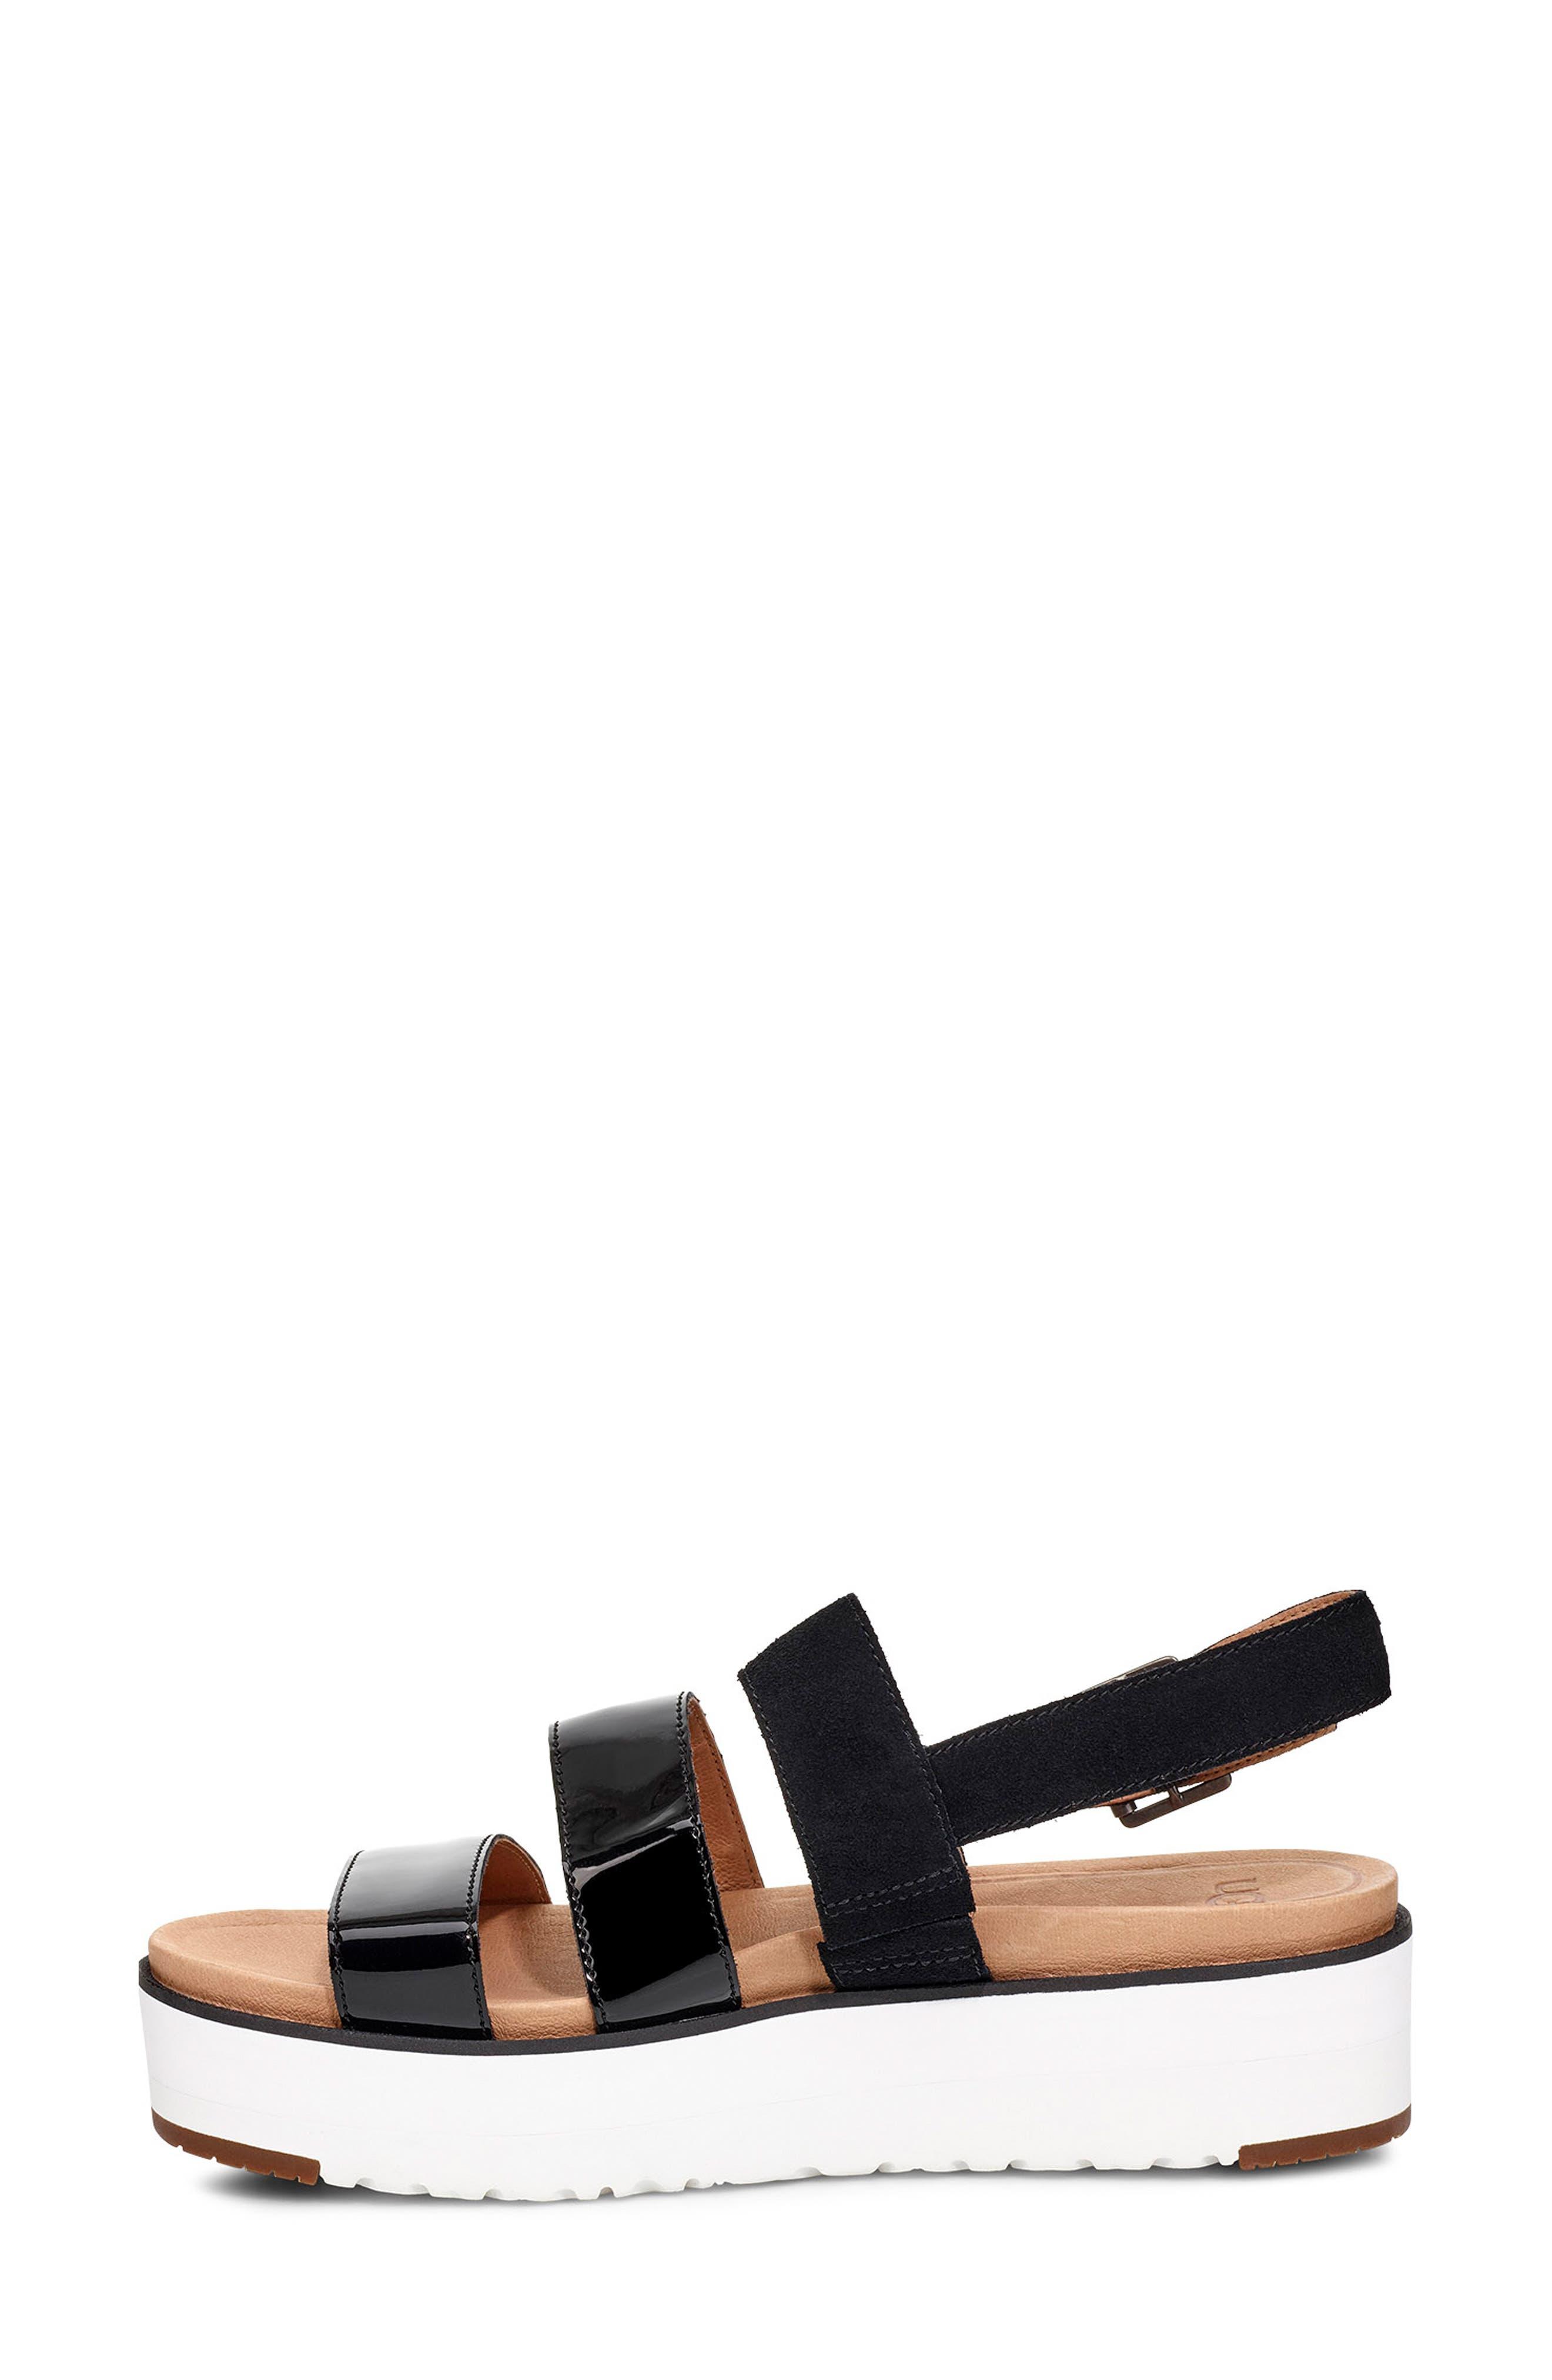 Braelynn Flatform Sandal,                             Alternate thumbnail 6, color,                             BLACK LEATHER